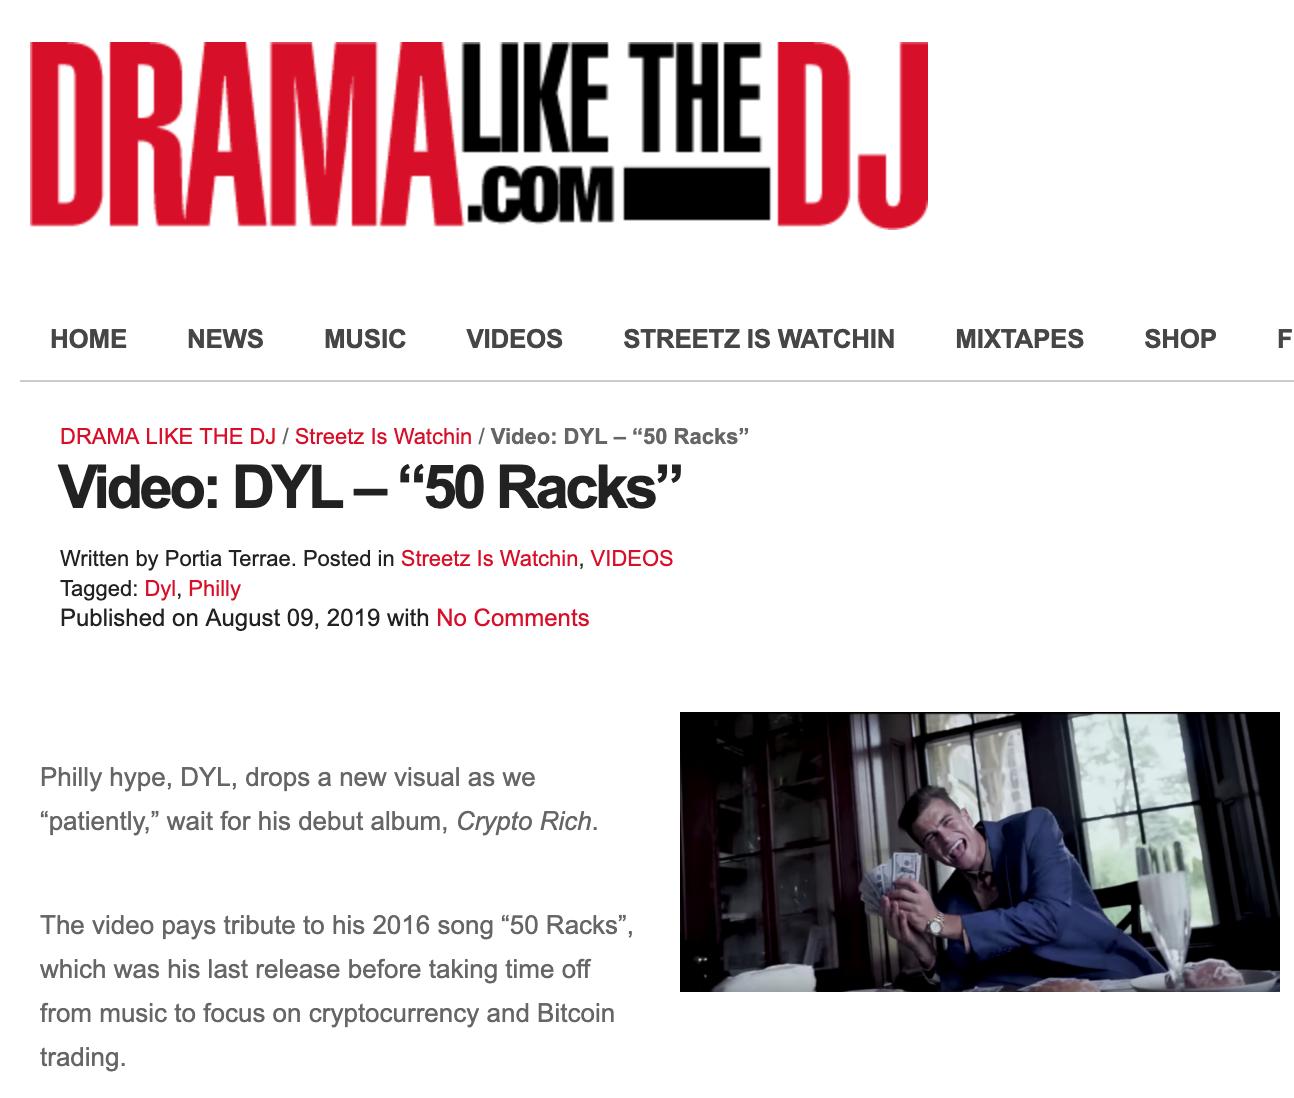 Dyl - 50 Racks DramaLikeTheDJ